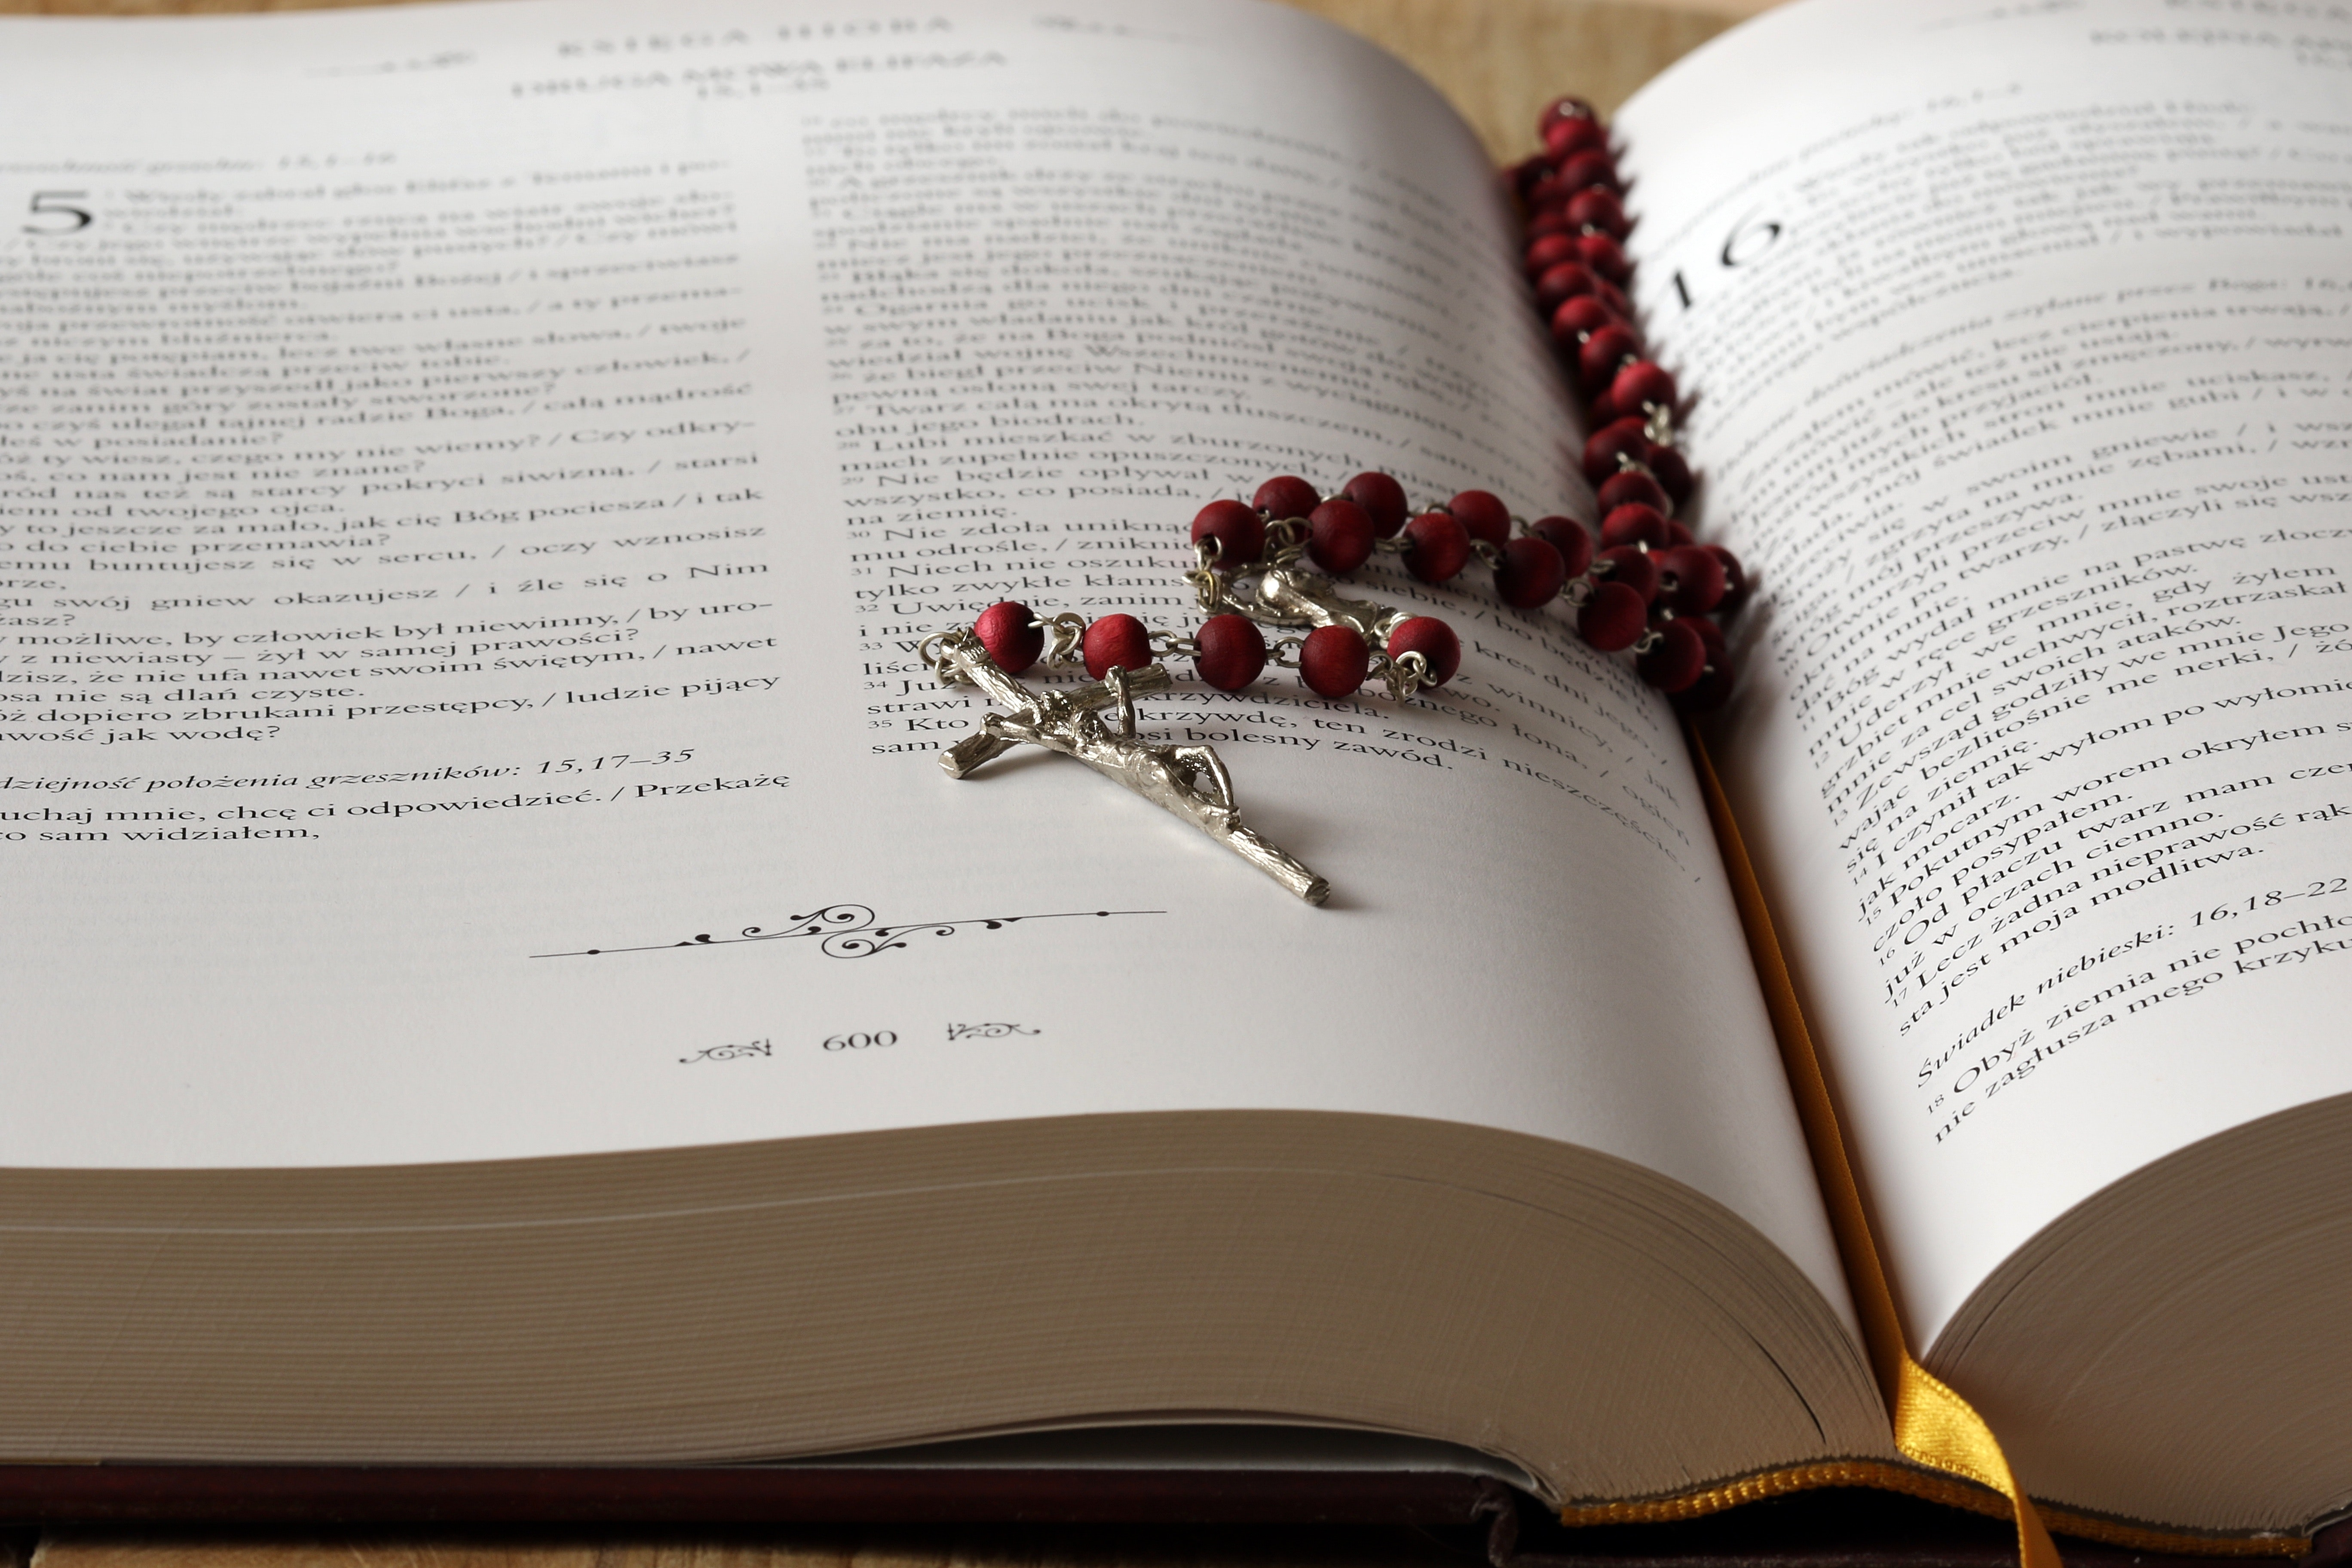 beads-bible-blur-236339